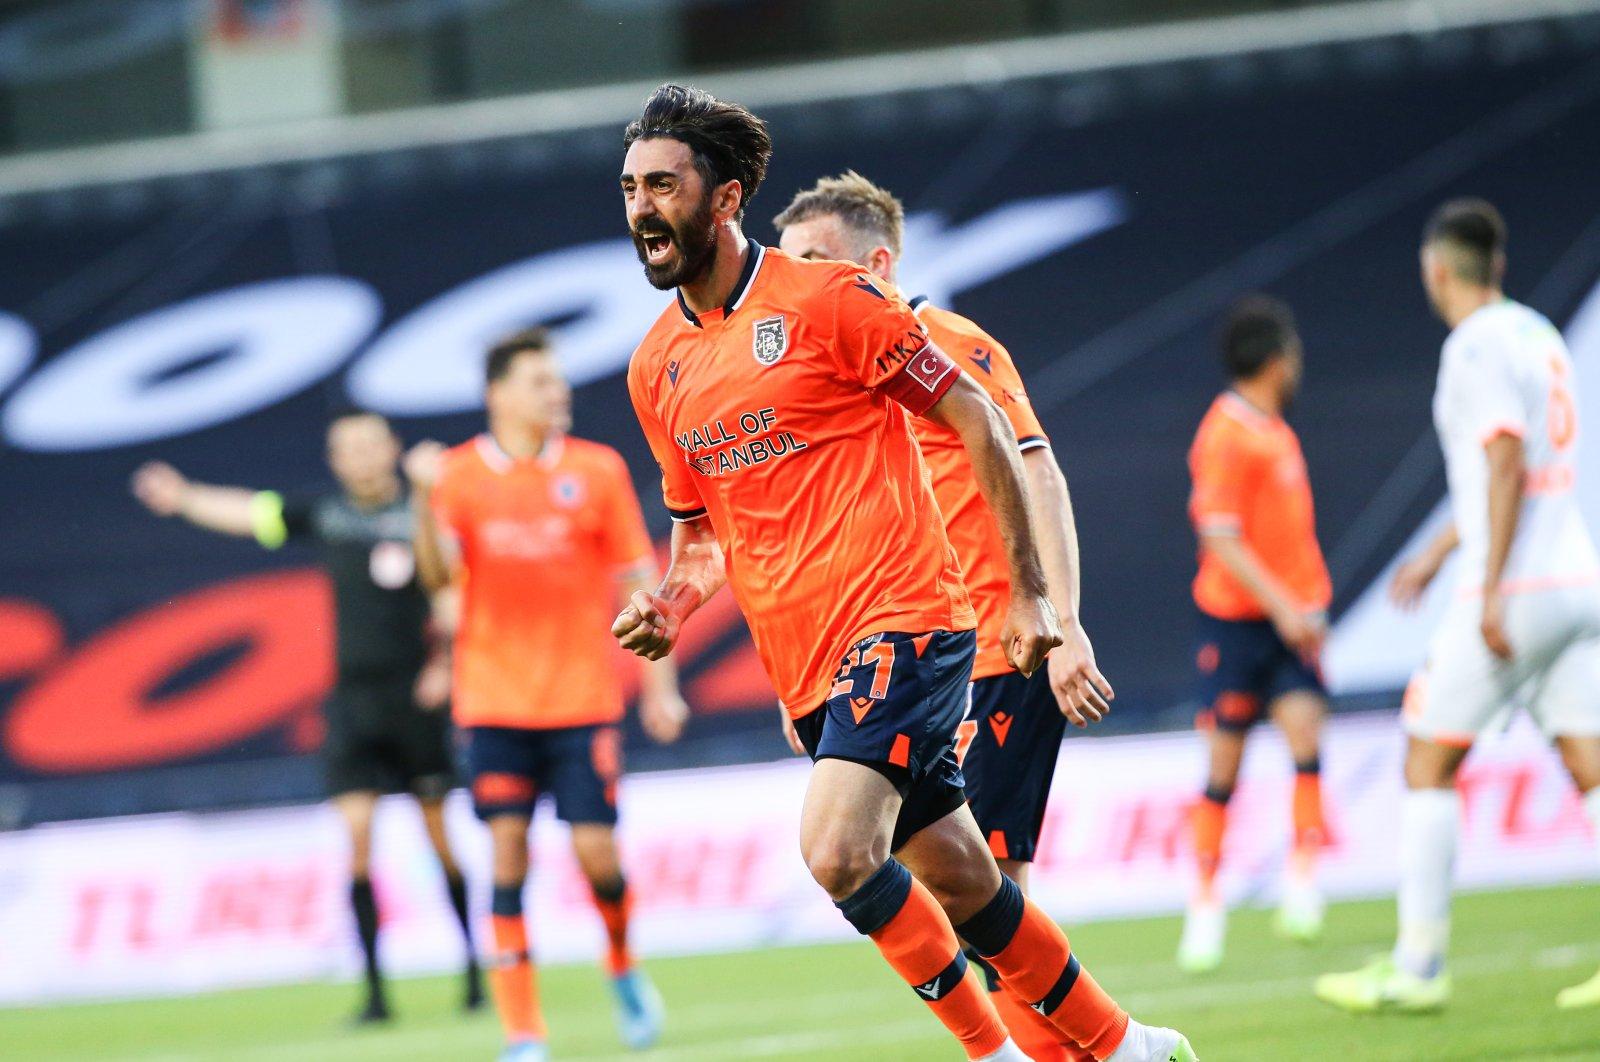 Başakşehir's Mahmut Takdemir celebrates a goal during a Süper Lig match against Alanyaspor, Istanbul, Turkey, June 13, 2020. (AA Photo)